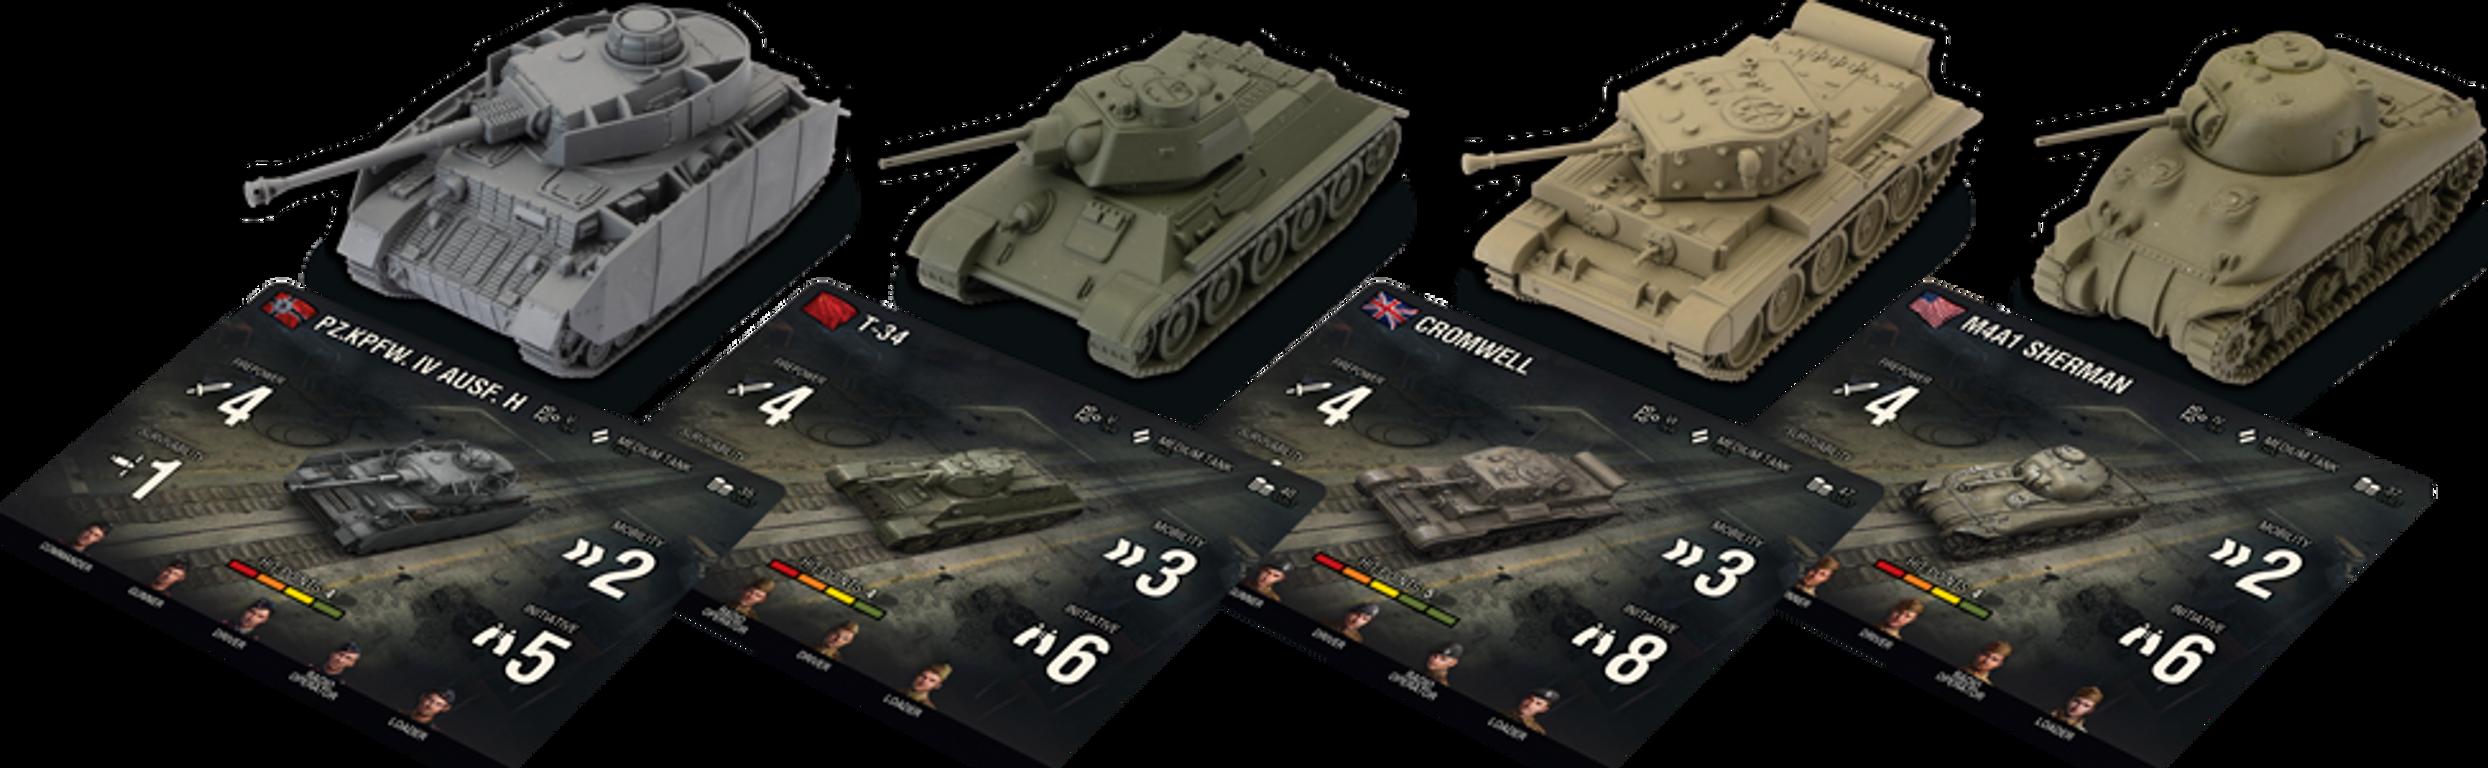 World of Tanks: Miniatures Game miniatures